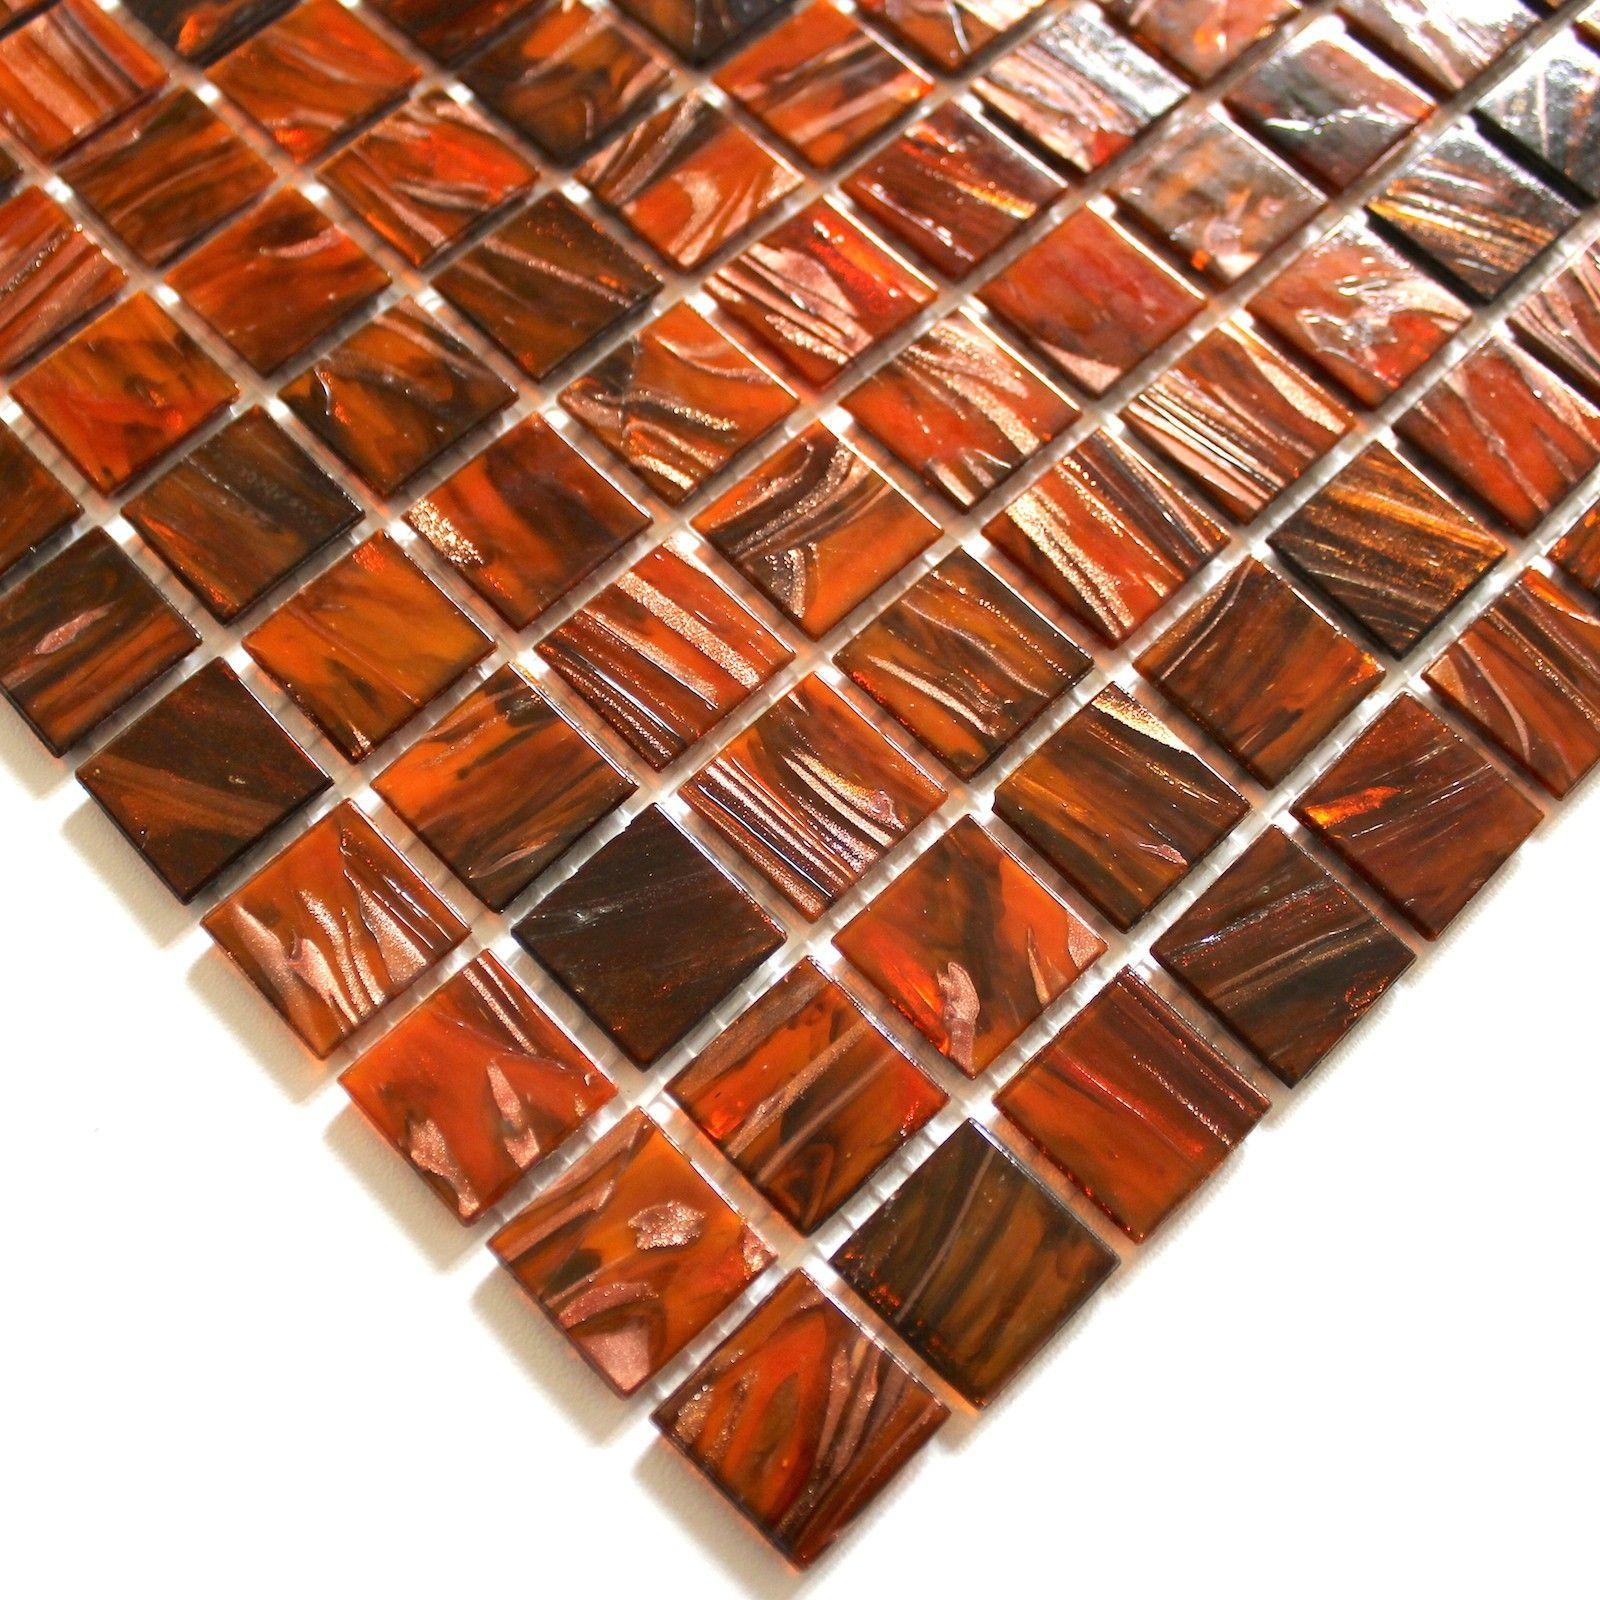 Mosaique Douche Pate De Verre Salle De Bain Vitro Orange 5 50